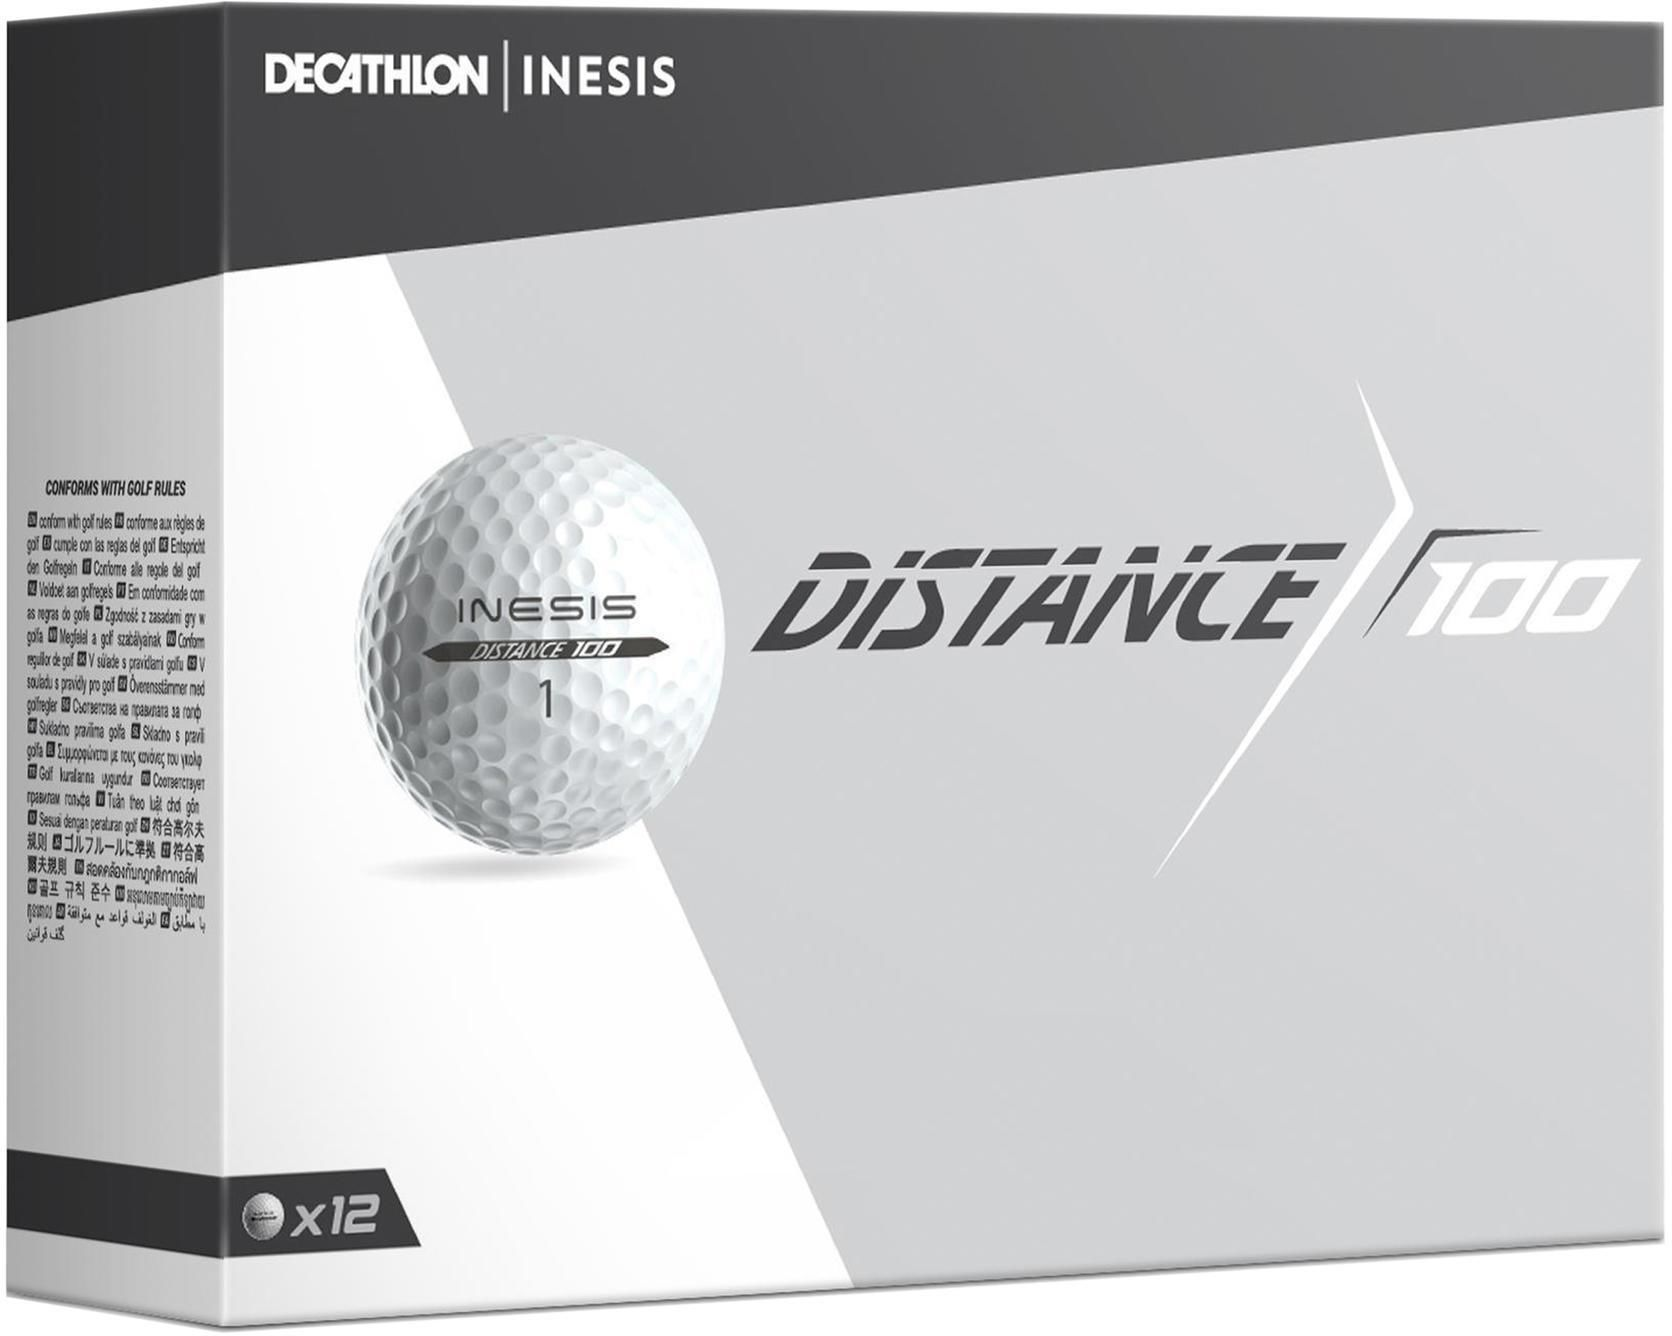 Piłka do golfa Distance 100 X12